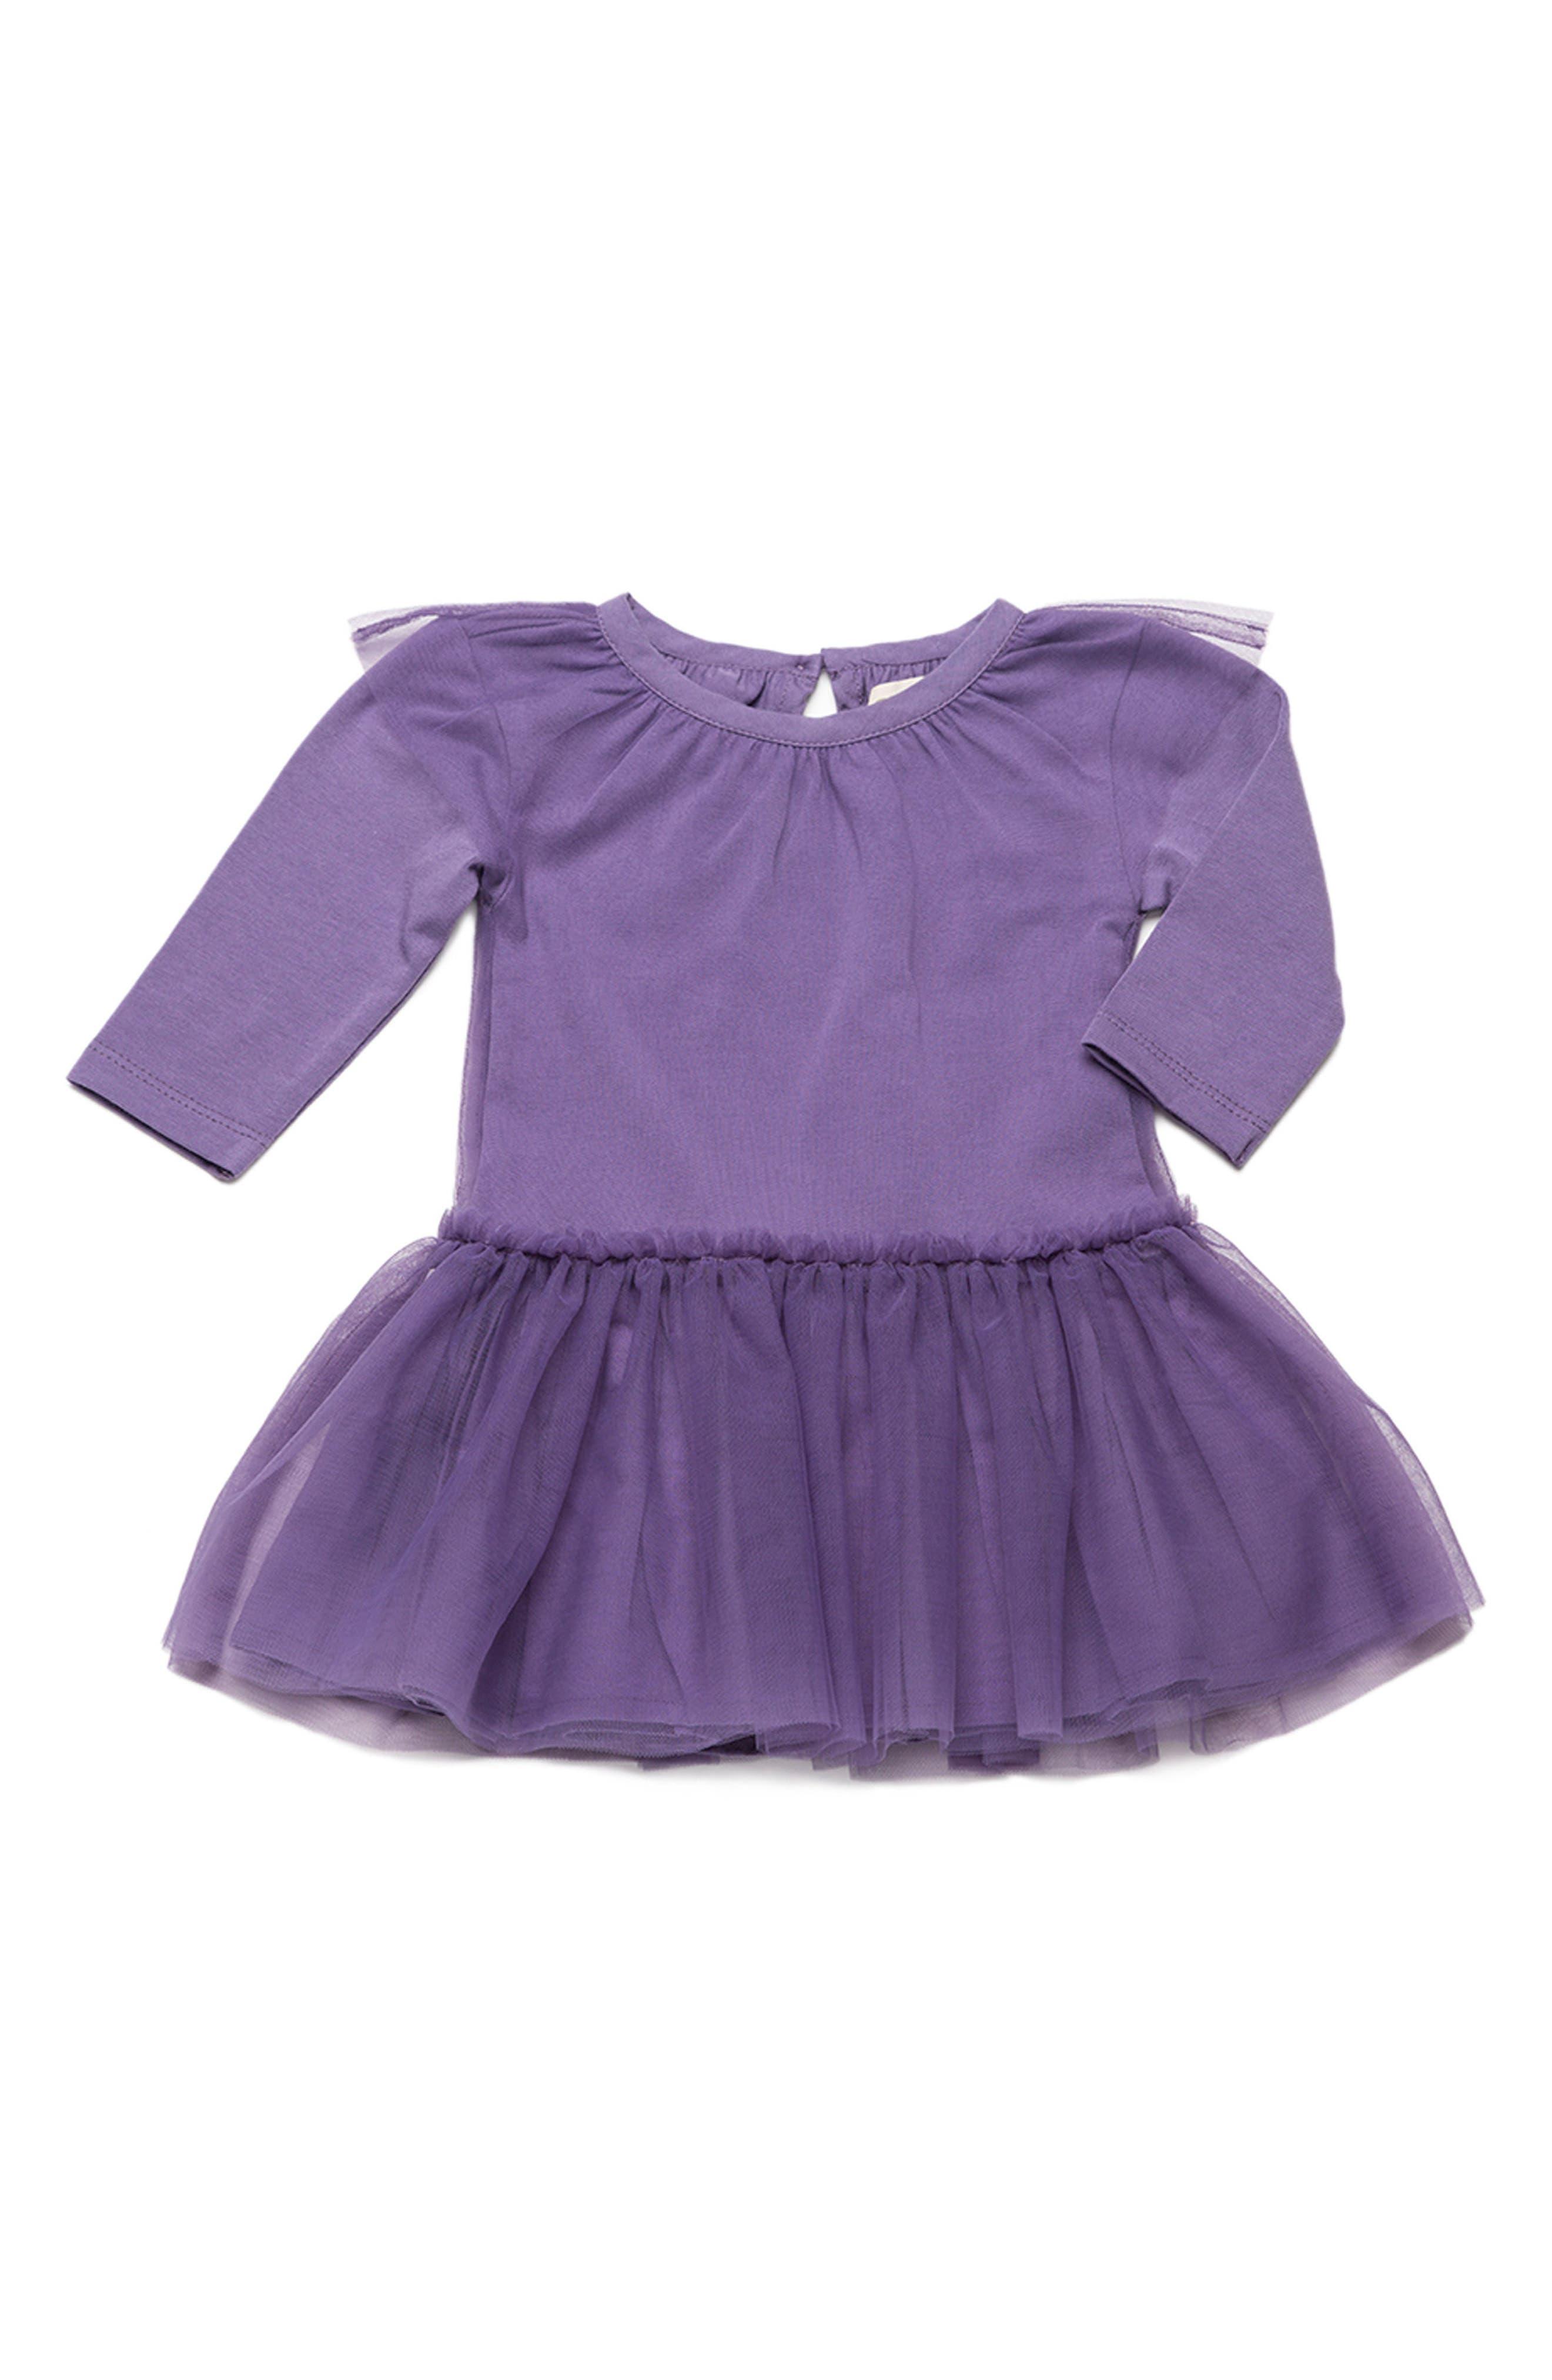 Little Belle Tulle Dress,                         Main,                         color, Dark Purple